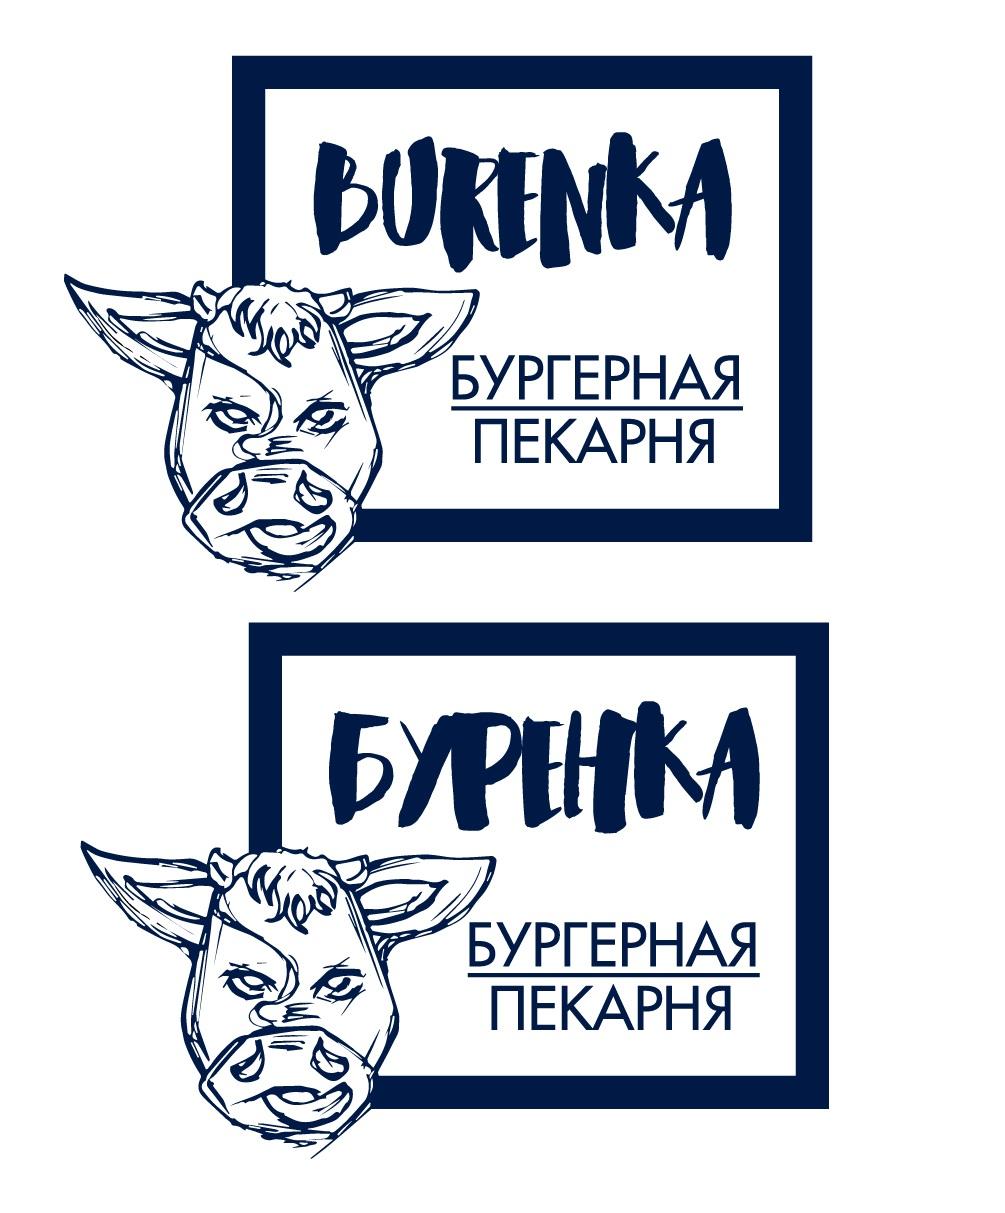 Логотип для Бургерной с Пекарней фото f_2305e123dd408e6f.jpg